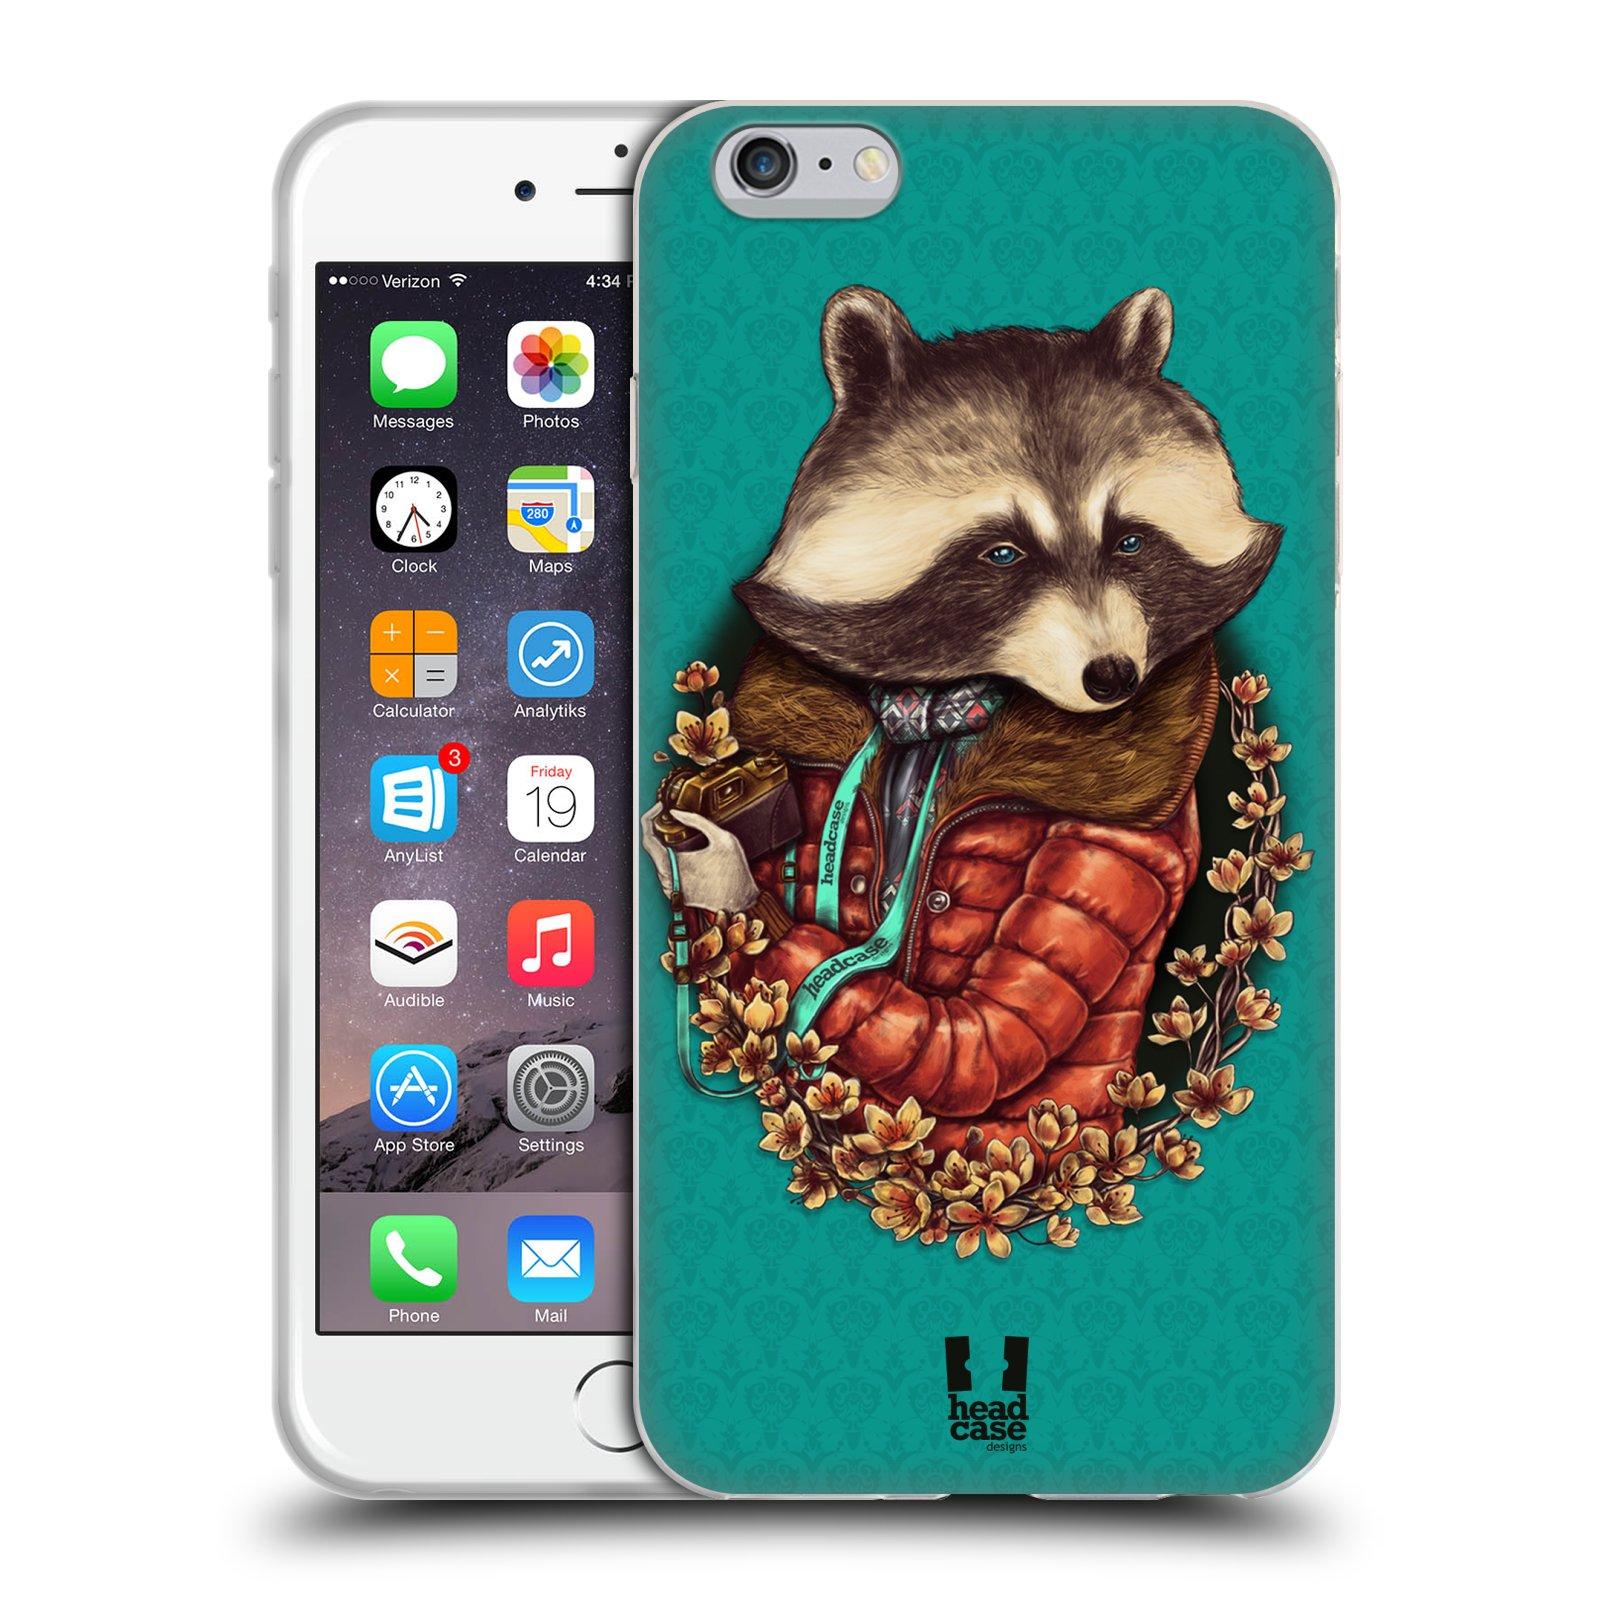 HEAD CASE silikonový obal na mobil Apple Iphone 6 PLUS/ 6S PLUS vzor módní zvířátka mýval